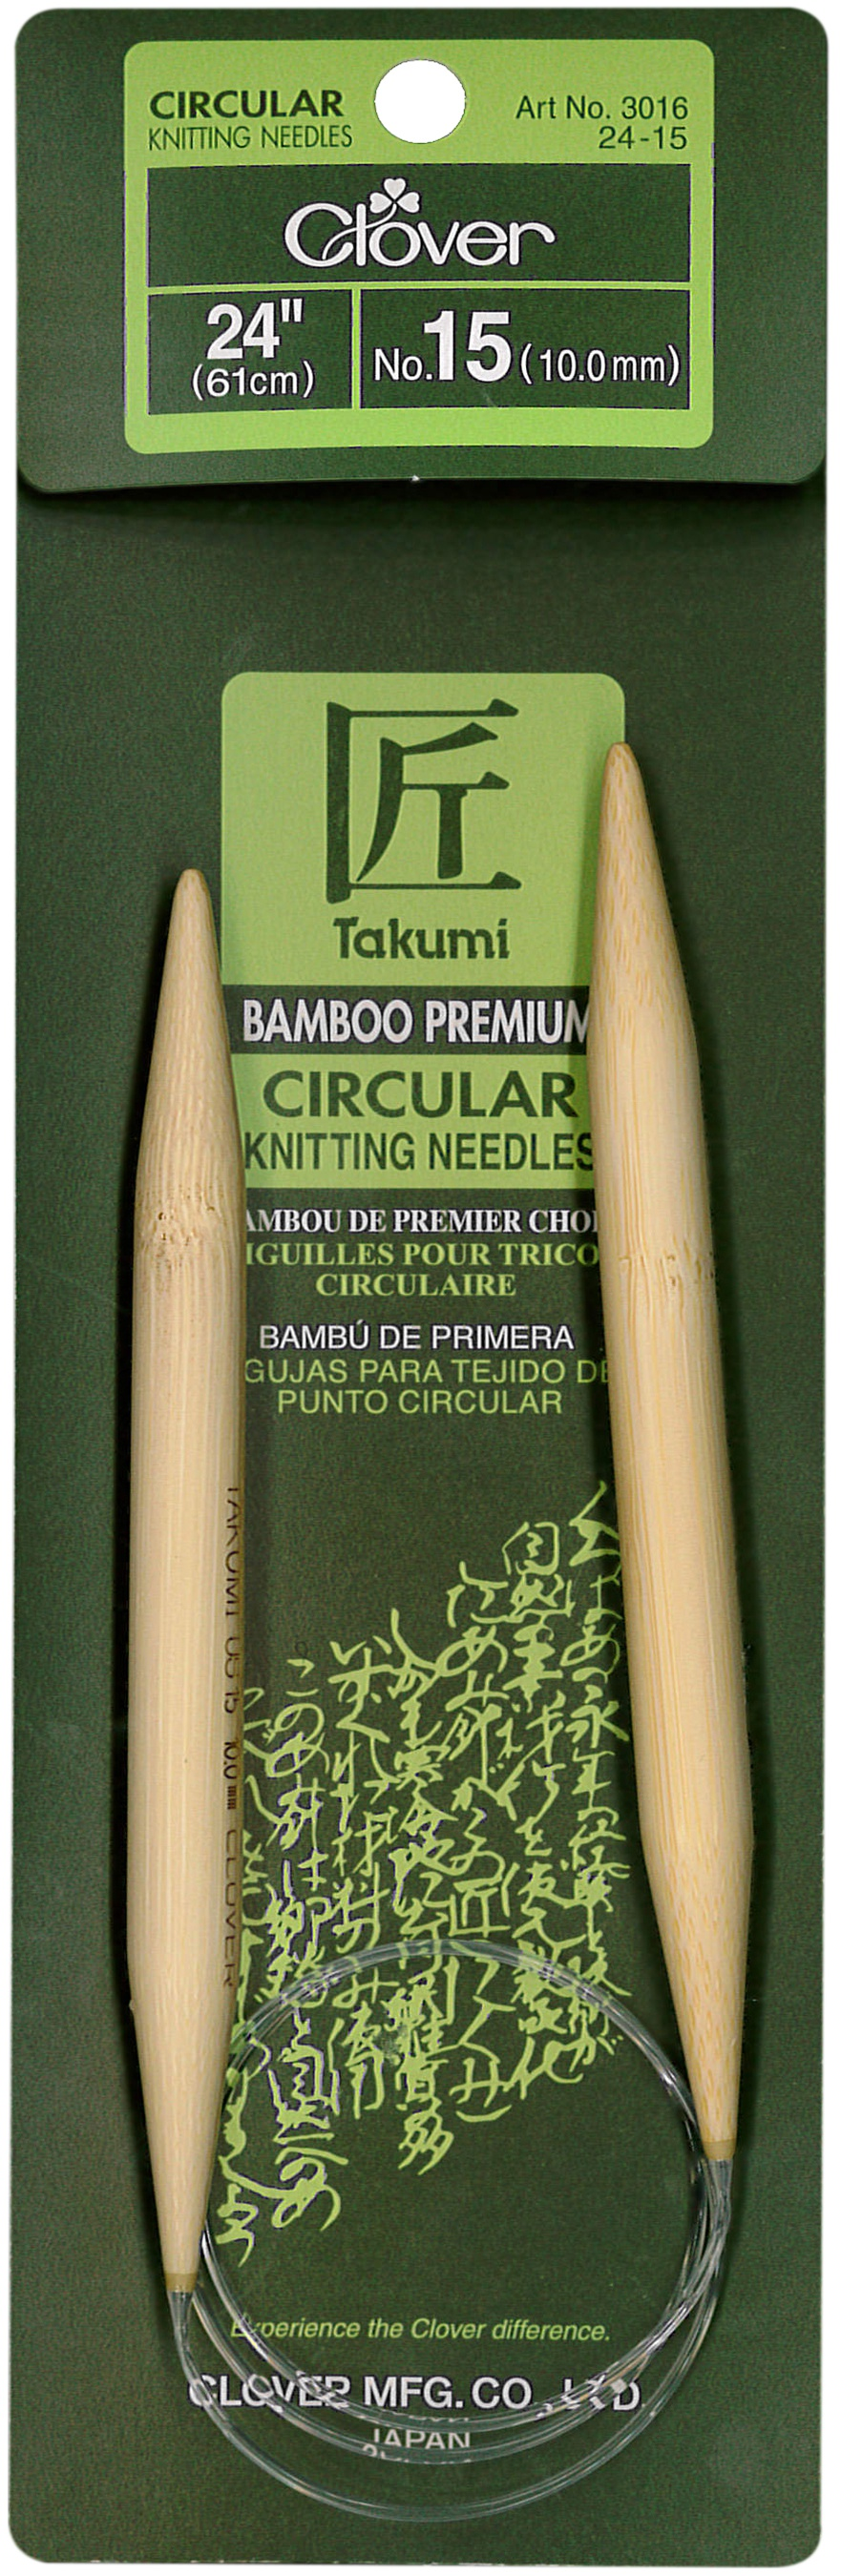 Takumi Bamboo Circular Knitting Needles 24-Size 15/10mm